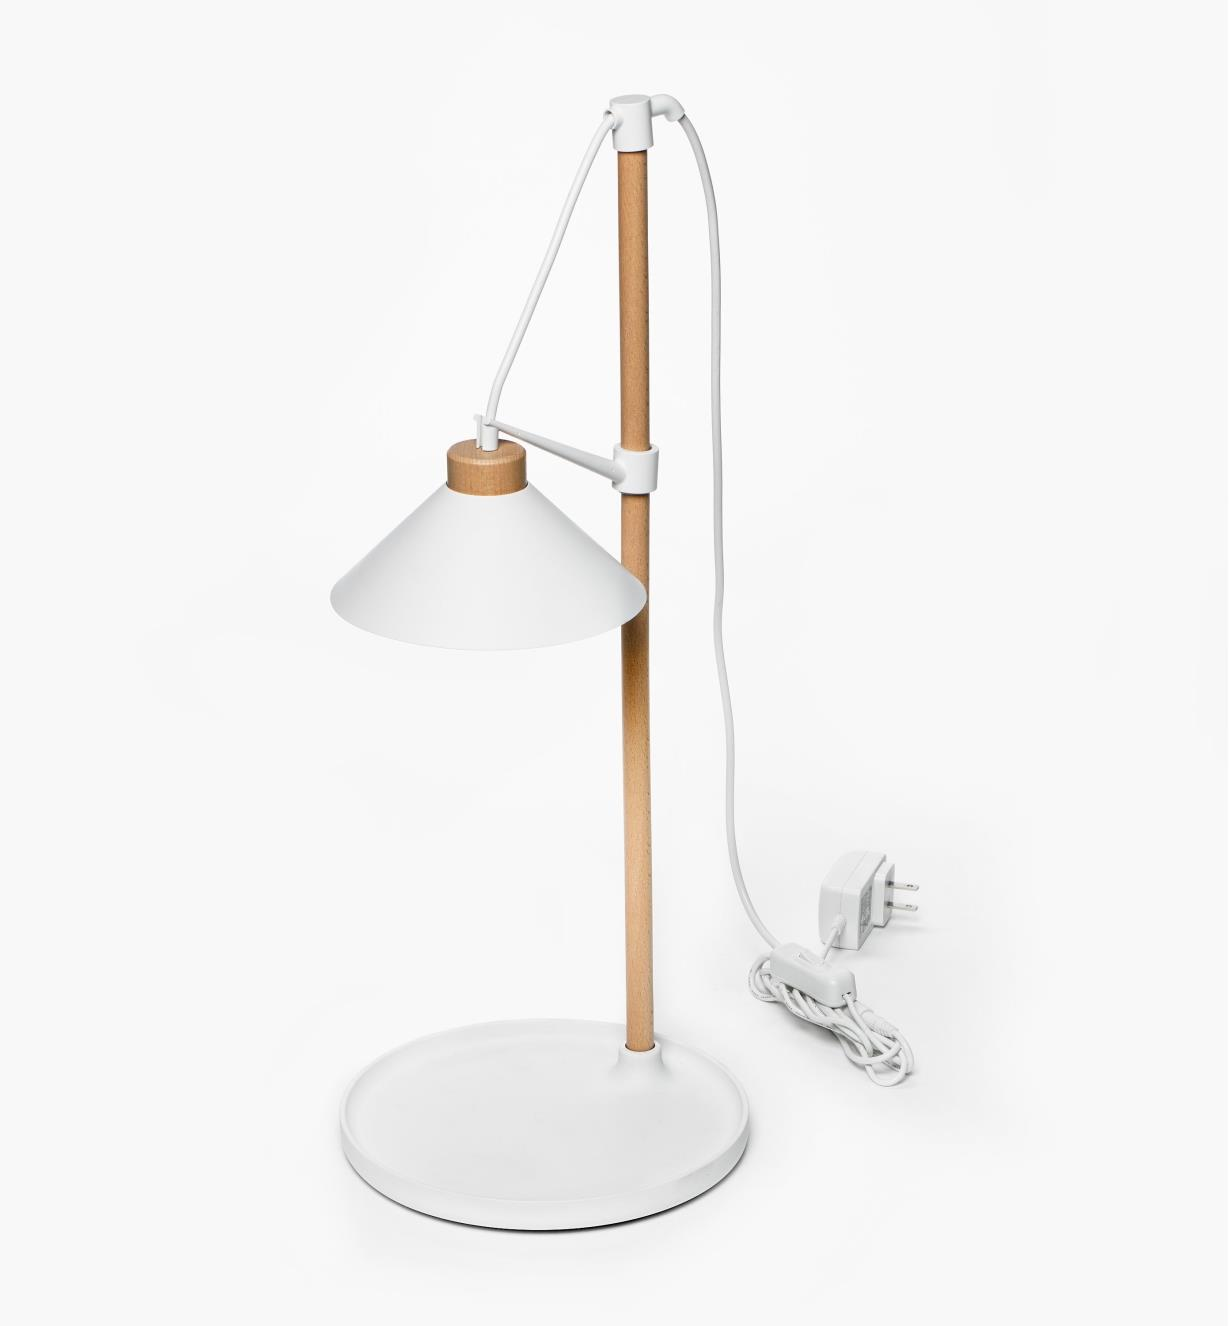 99W9206 - LED Desk Grow Light